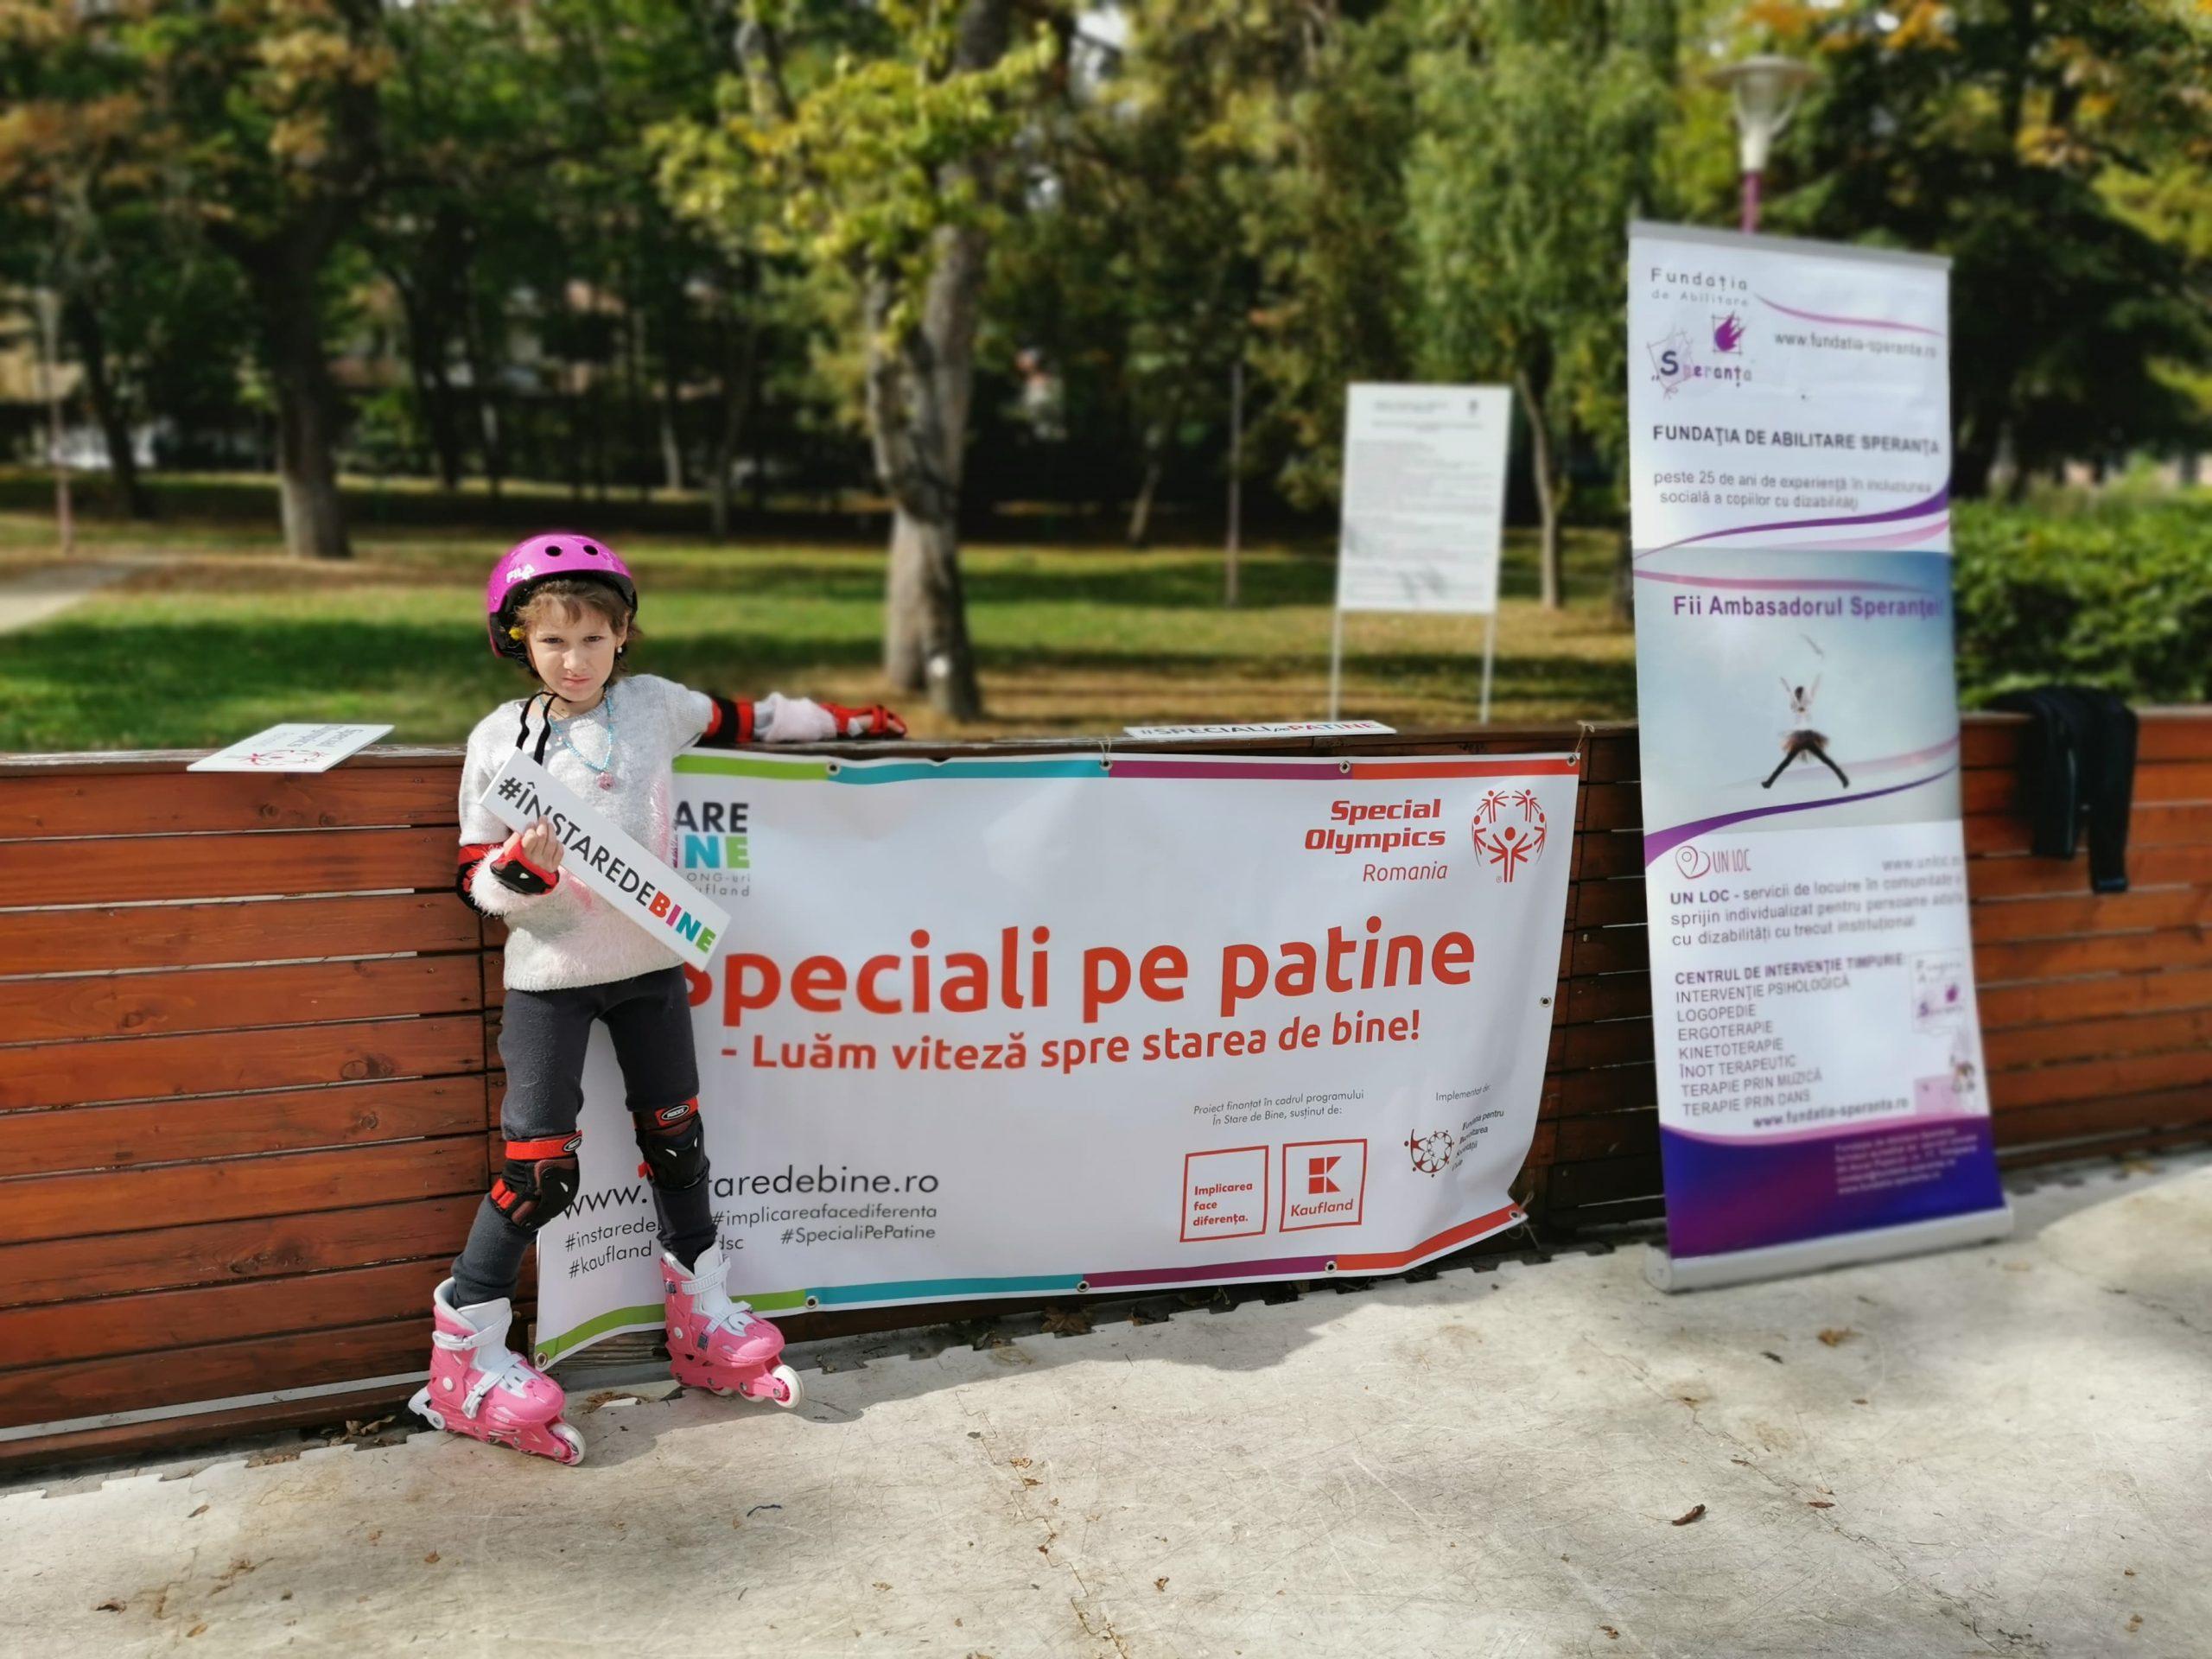 Speciali pe patine, Special Olympics, Timisoara (6)